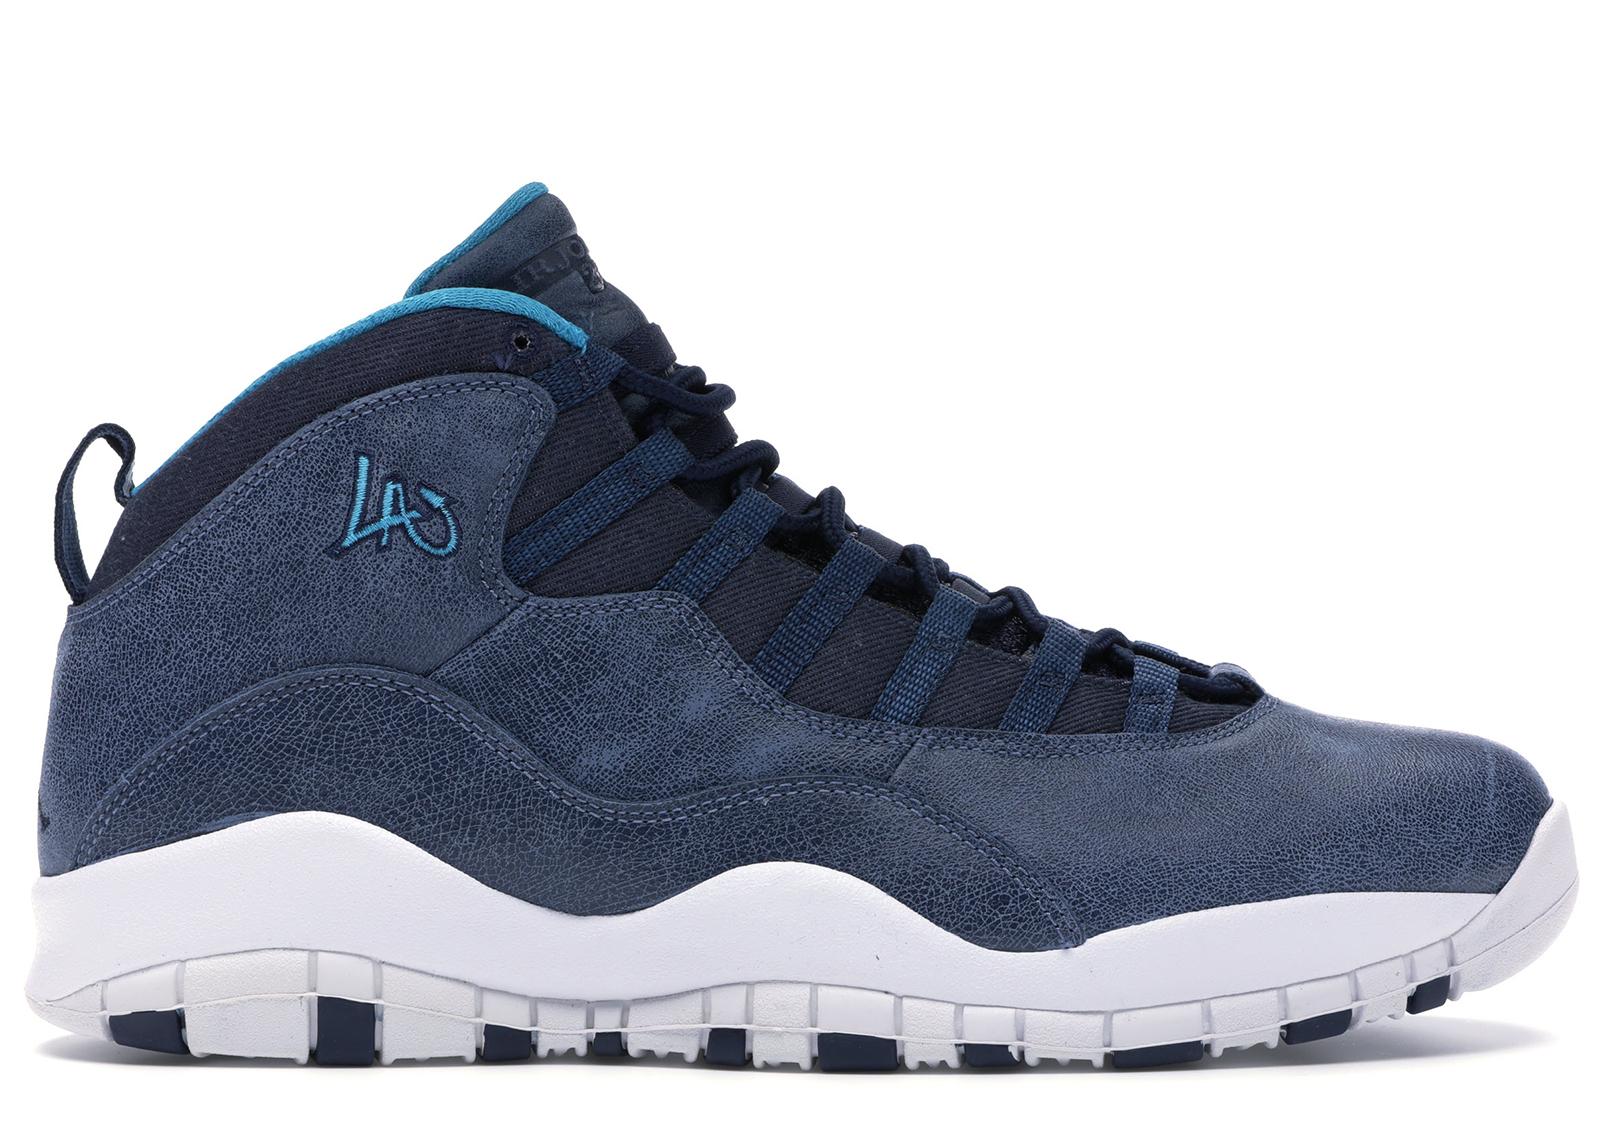 Jordan 10 Retro Los Angeles - 310805-404